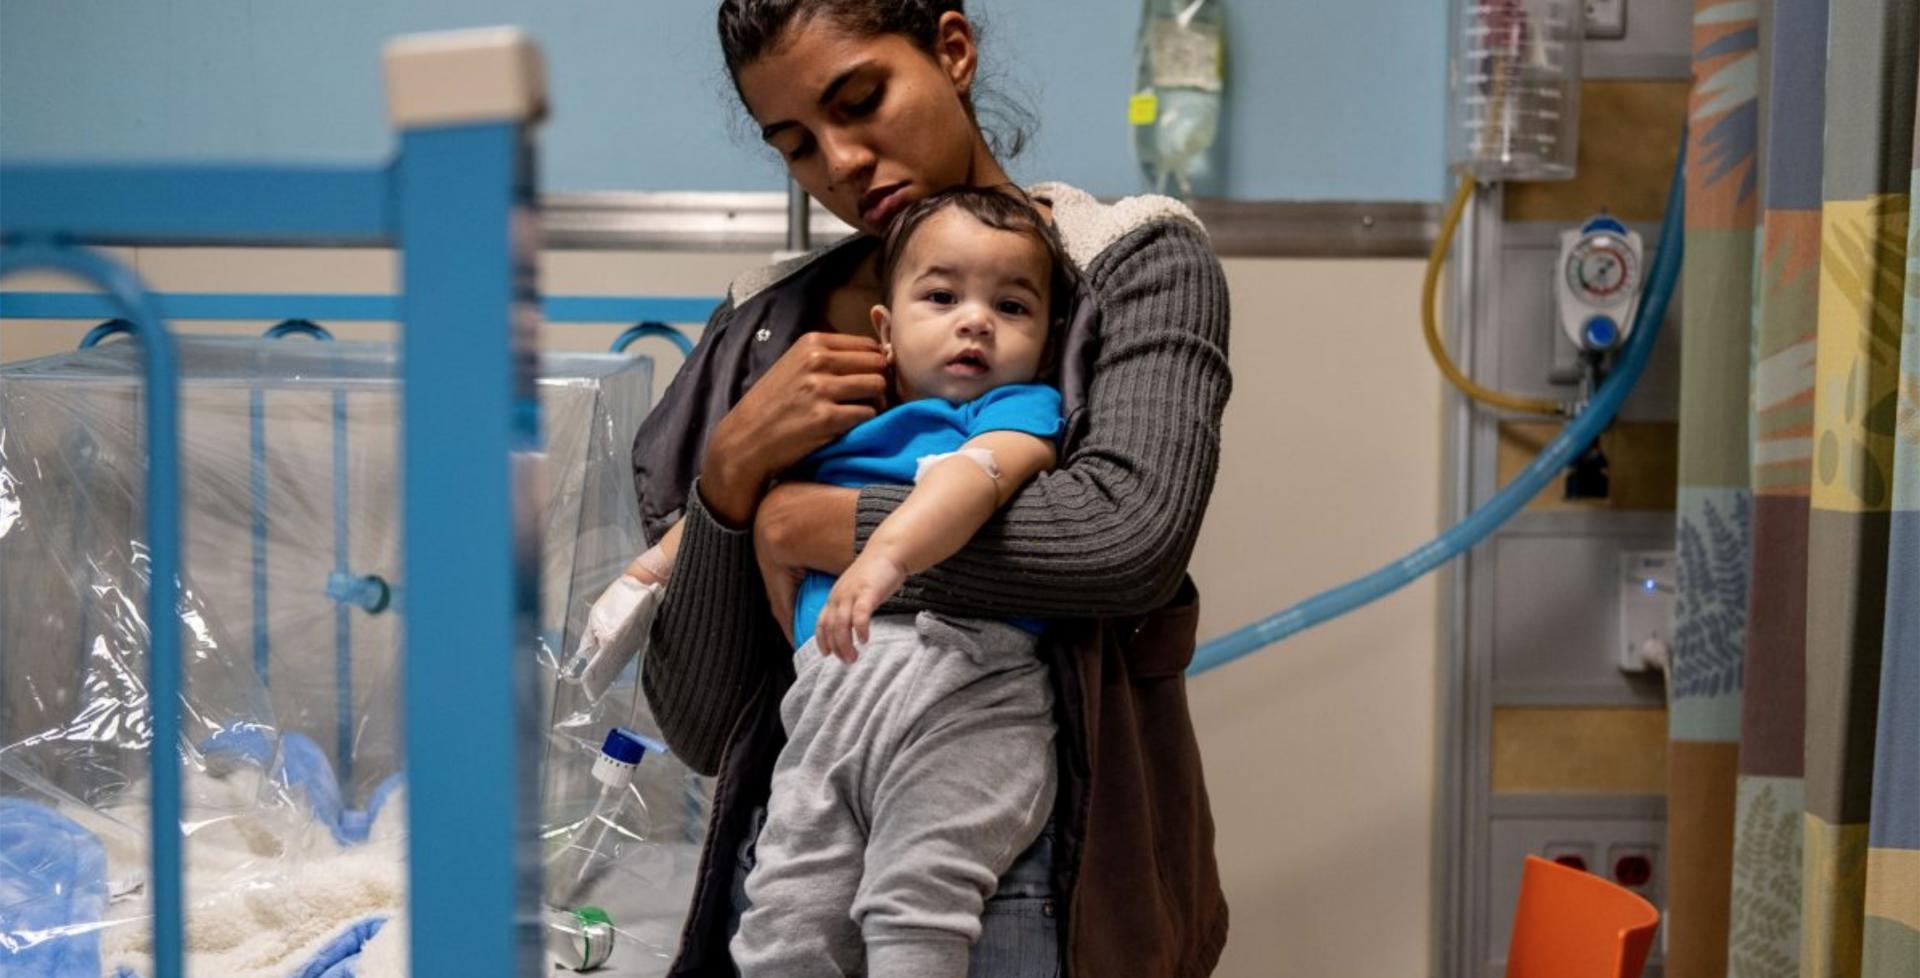 Nurse holding baby boy